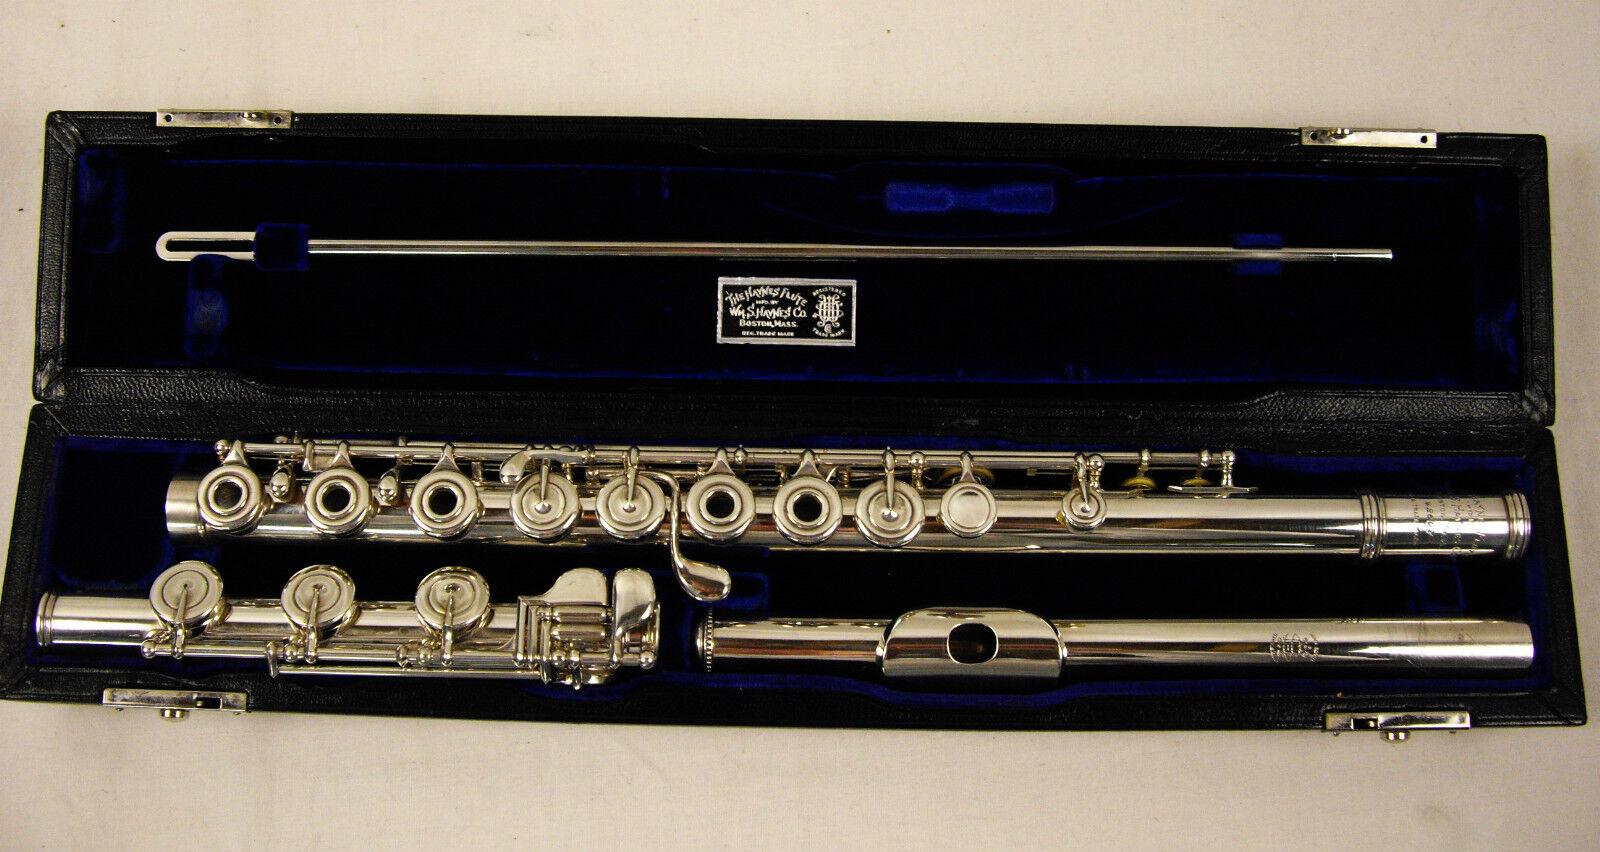 William S. Haynes Professional Handmade Flute Soldered Tone Holes Low B Wow